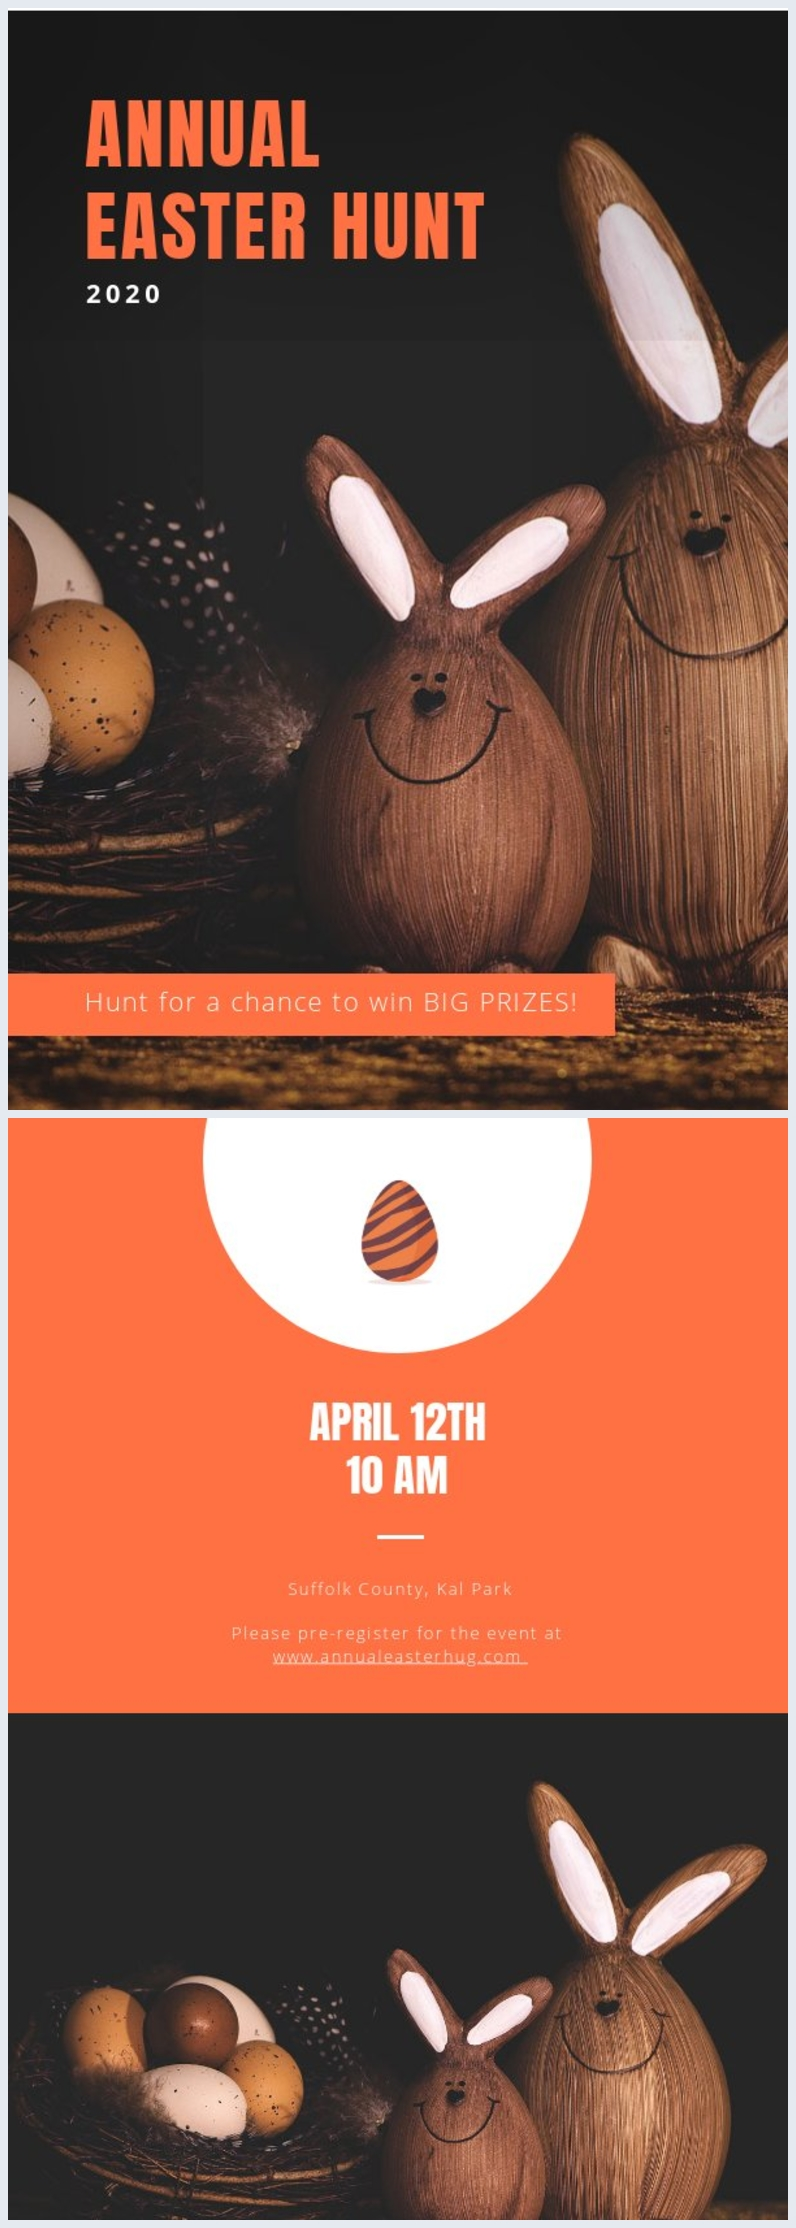 Easter Egg Hunt 2020 Invitation Template